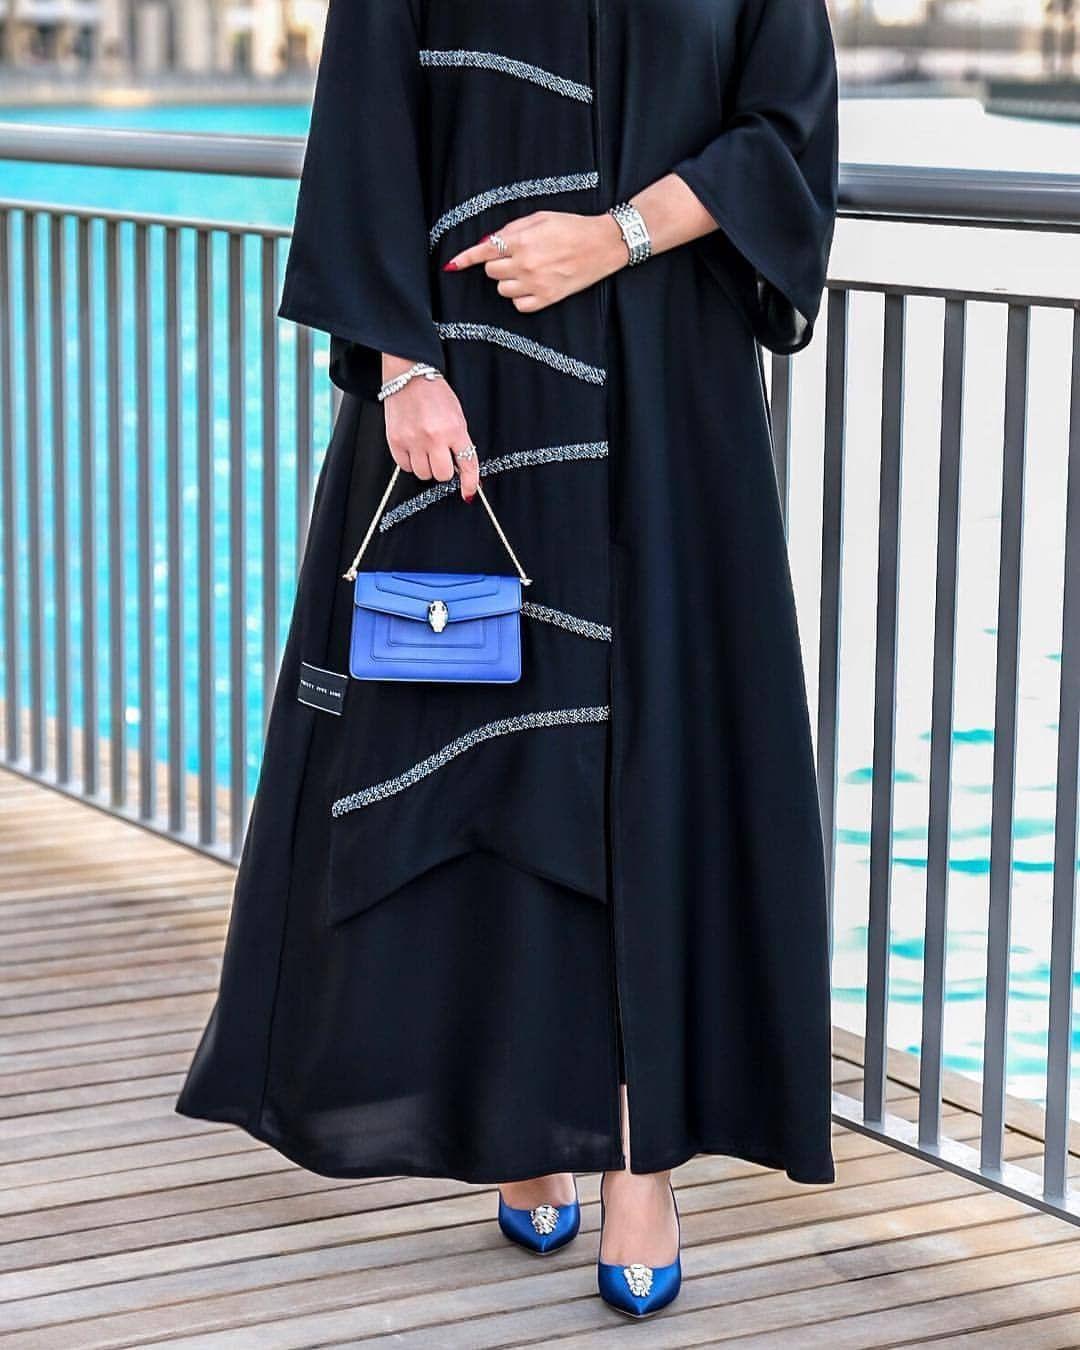 Repost Elegant Boutique With Instatoolsapp E21 عباية سودا مع كحلي مع شك Subhanabayas Fashionblog L Abaya Fashion Dubai Abaya Fashion Abayas Fashion